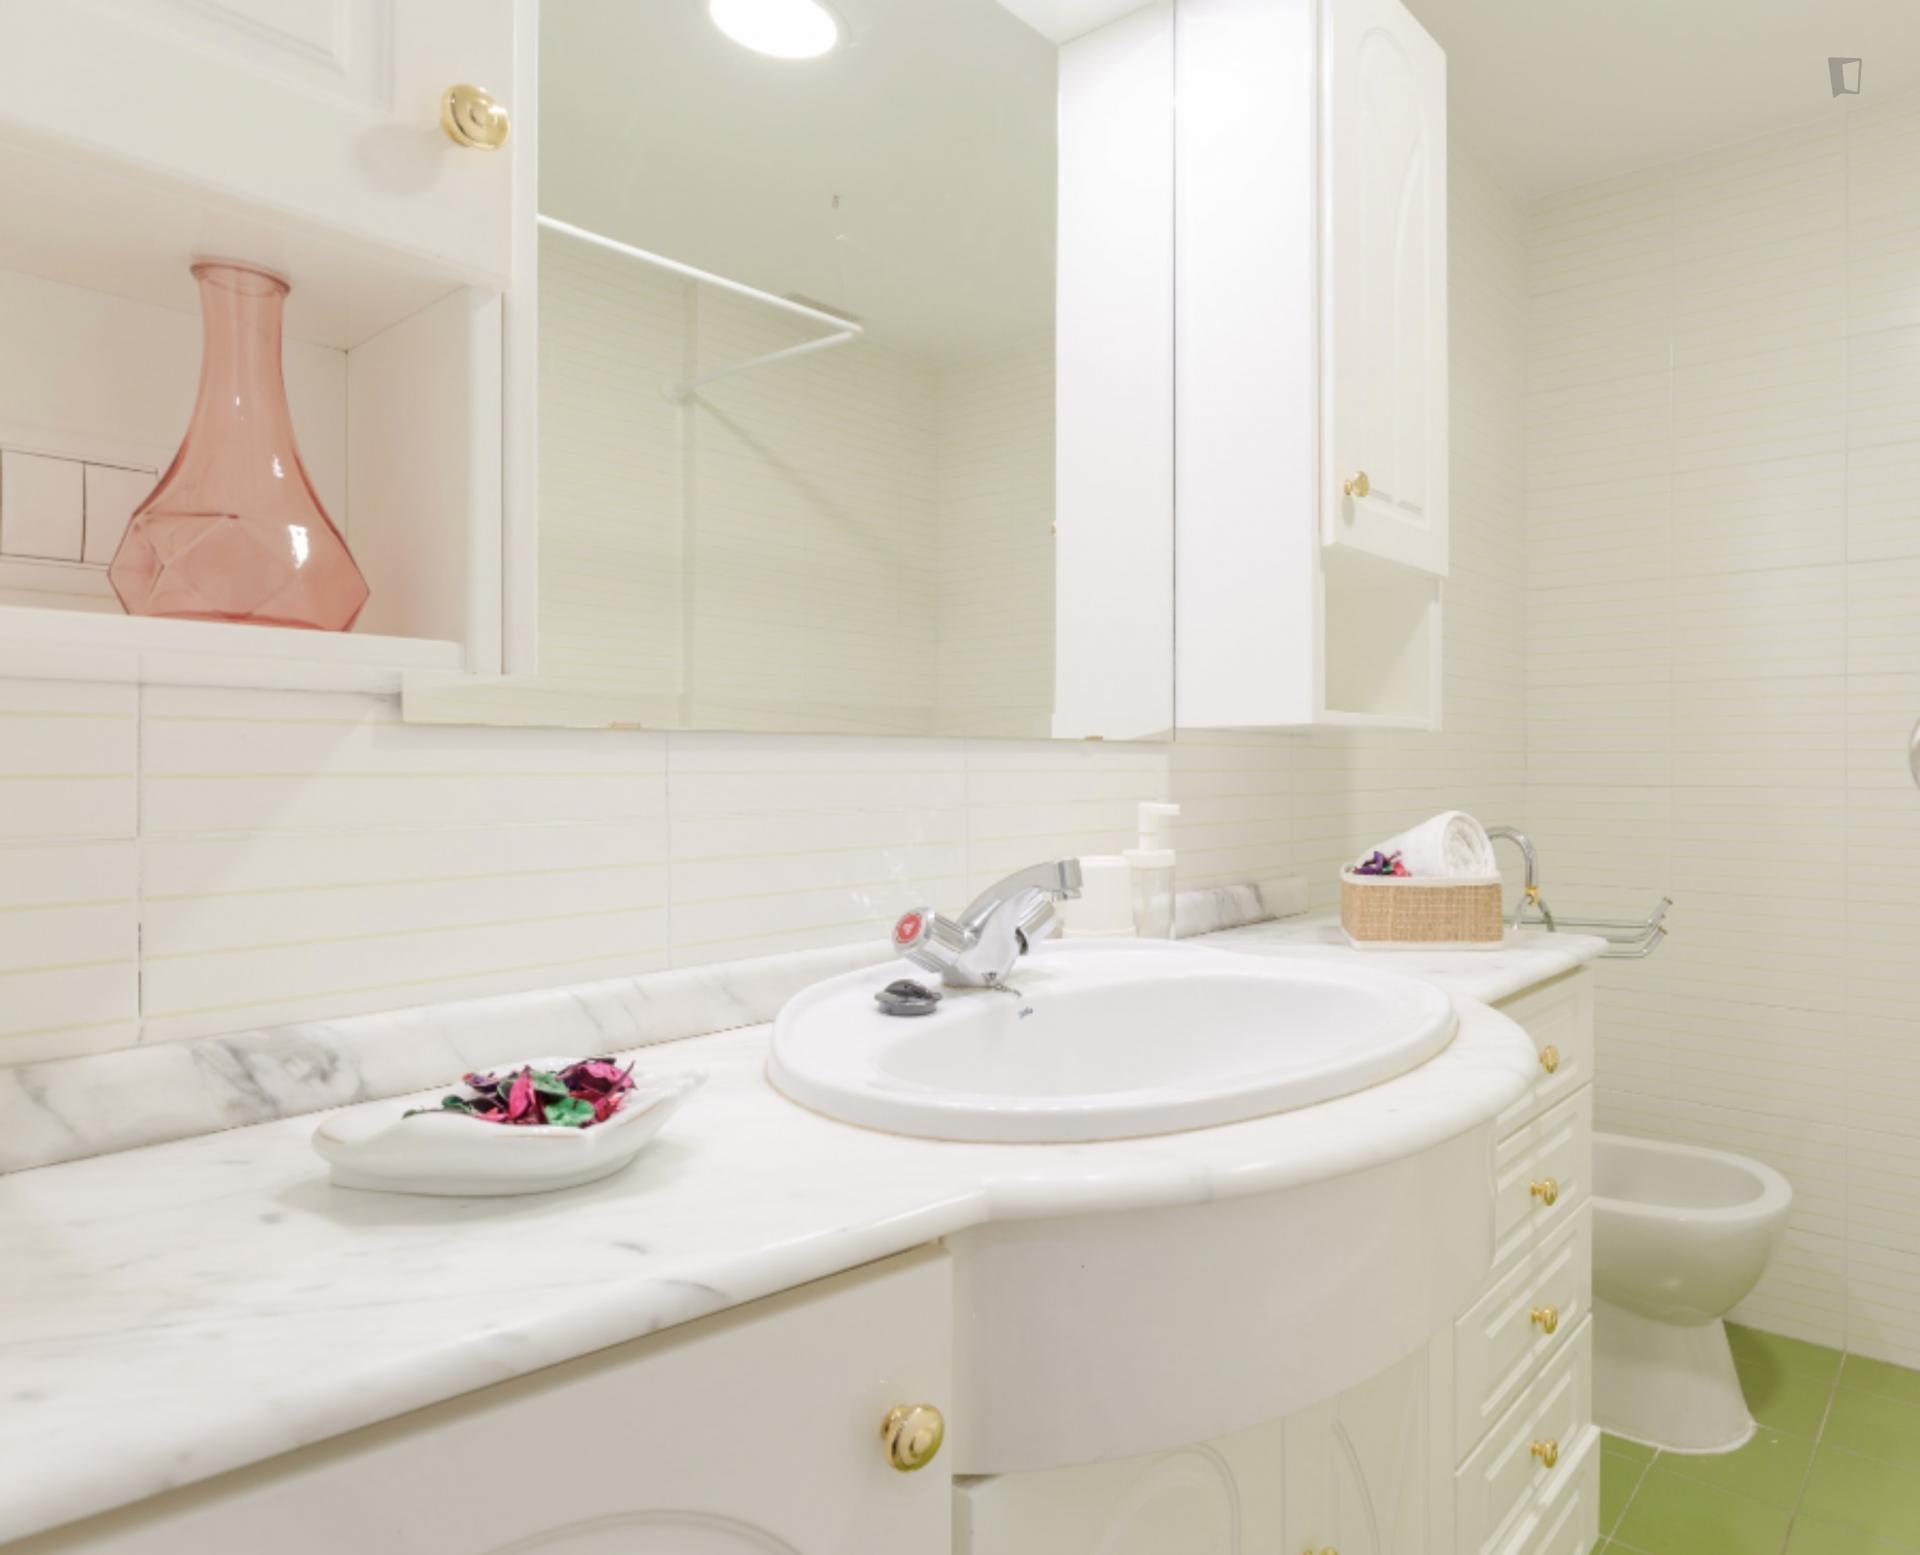 Ensanche - Nice apartment in Alicante